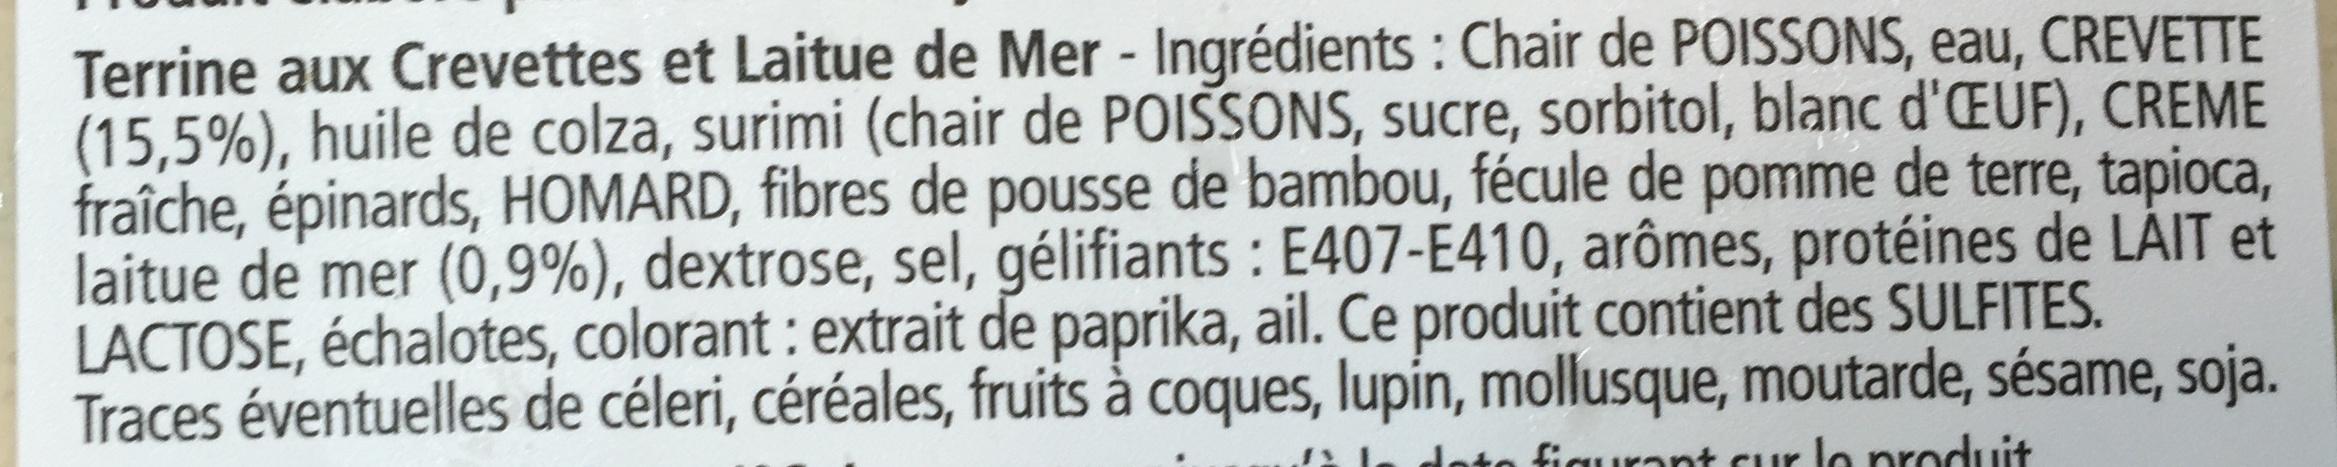 Les Terrines Marines Crevettes et Laitue de Mer - Ingredients